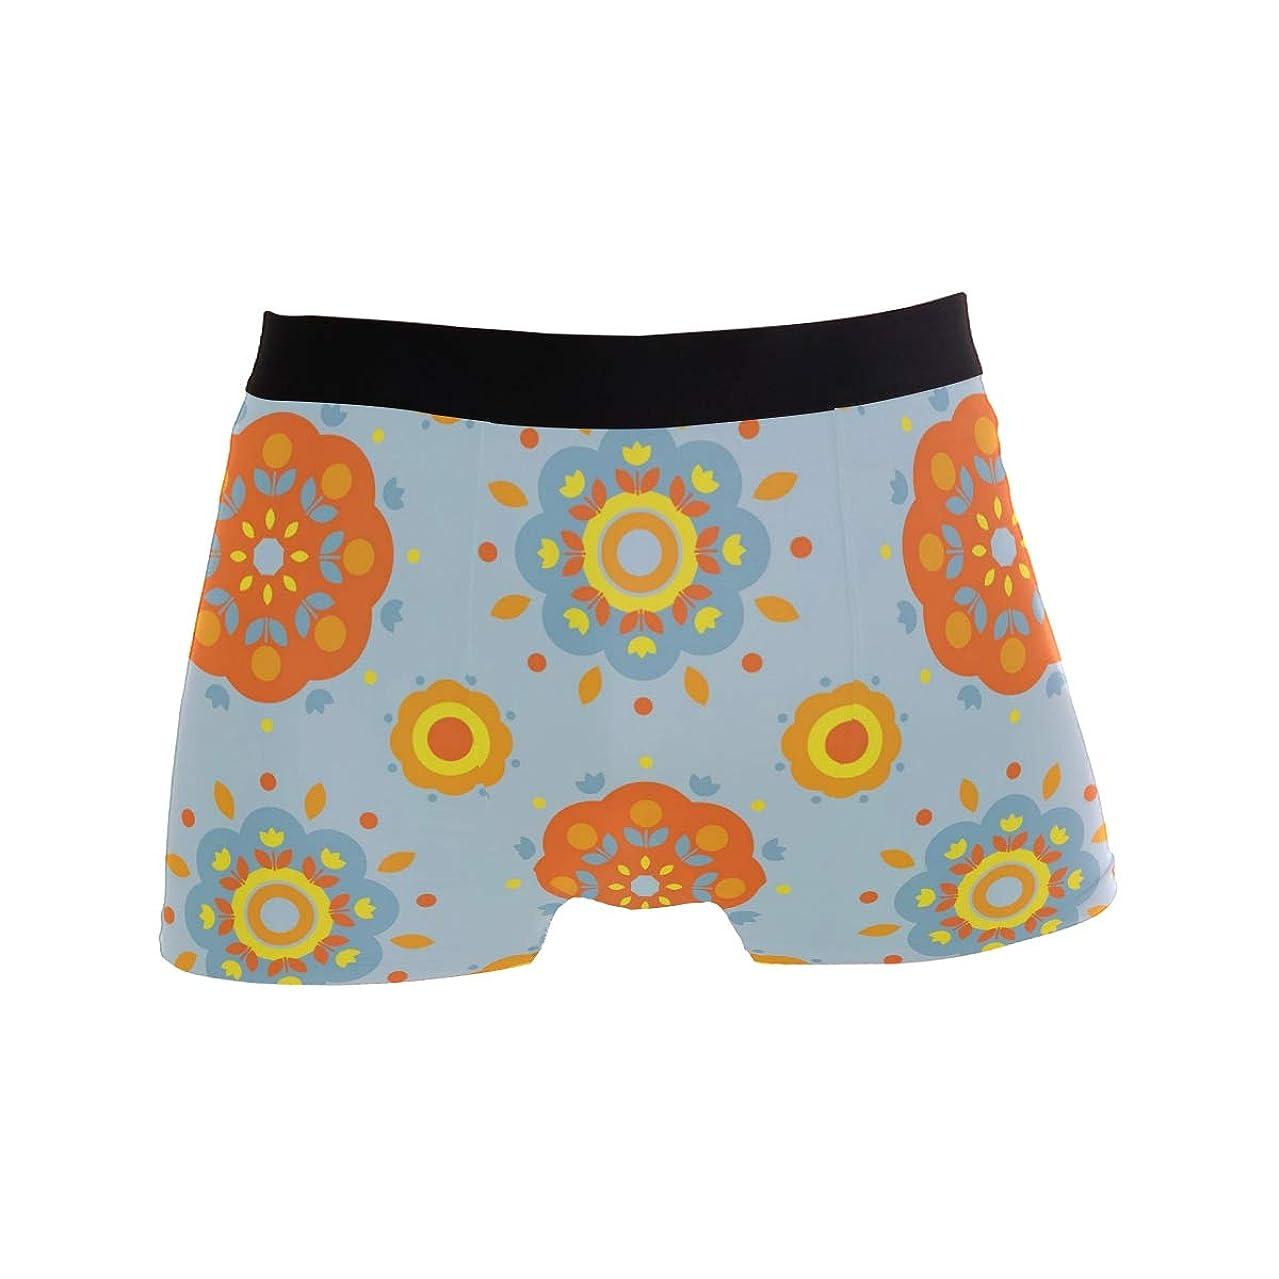 SLAFD Yellow Flower Pattern Men's Boxer Briefs Regular Soft Breathable Comfortable Underwear